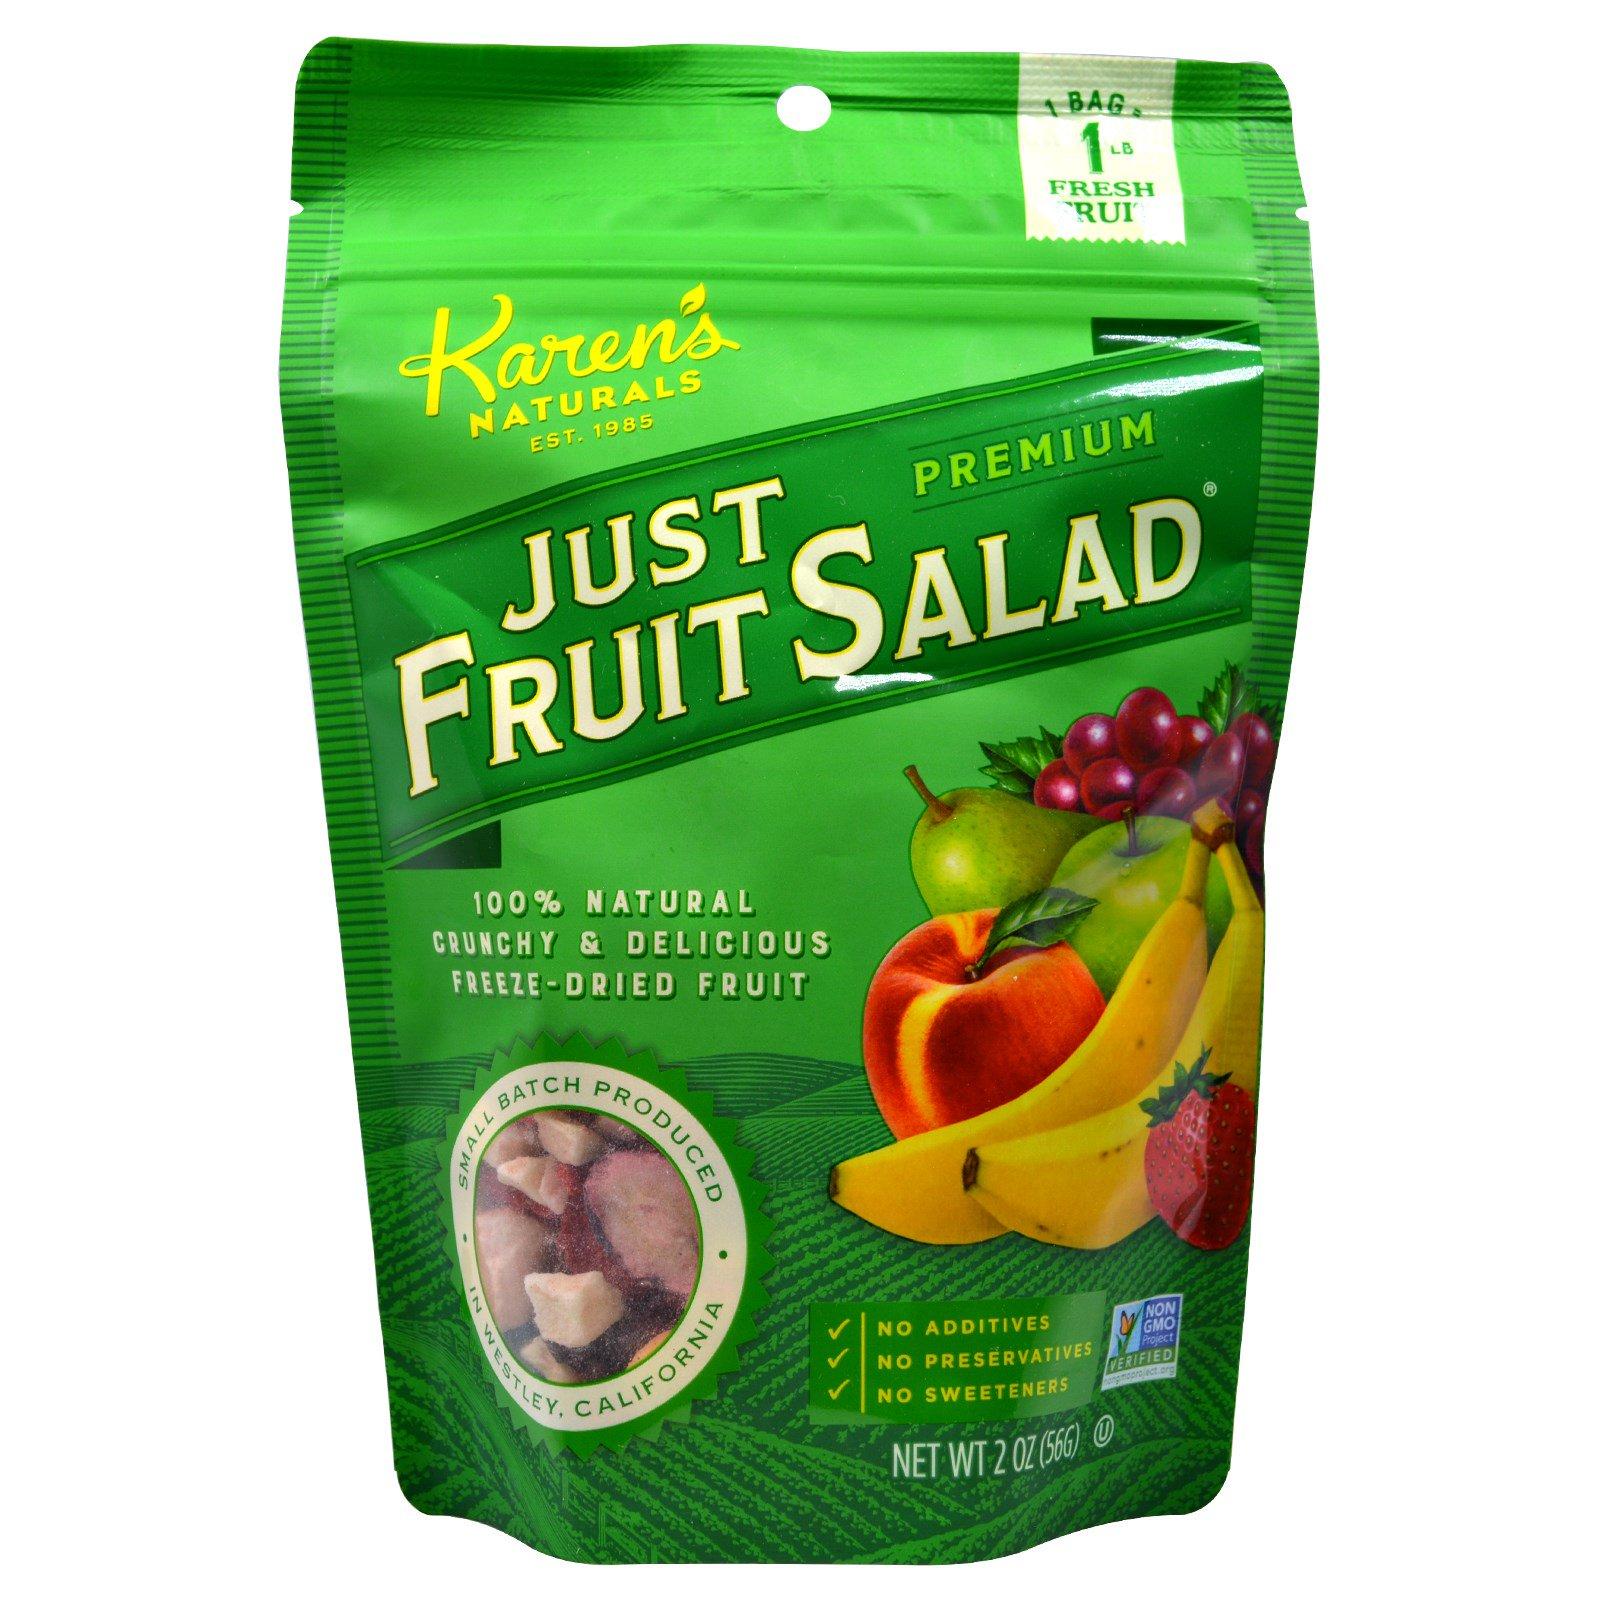 Karen's Naturals, Просто фруктовый салат, Премиум, 2 унции (56 г)